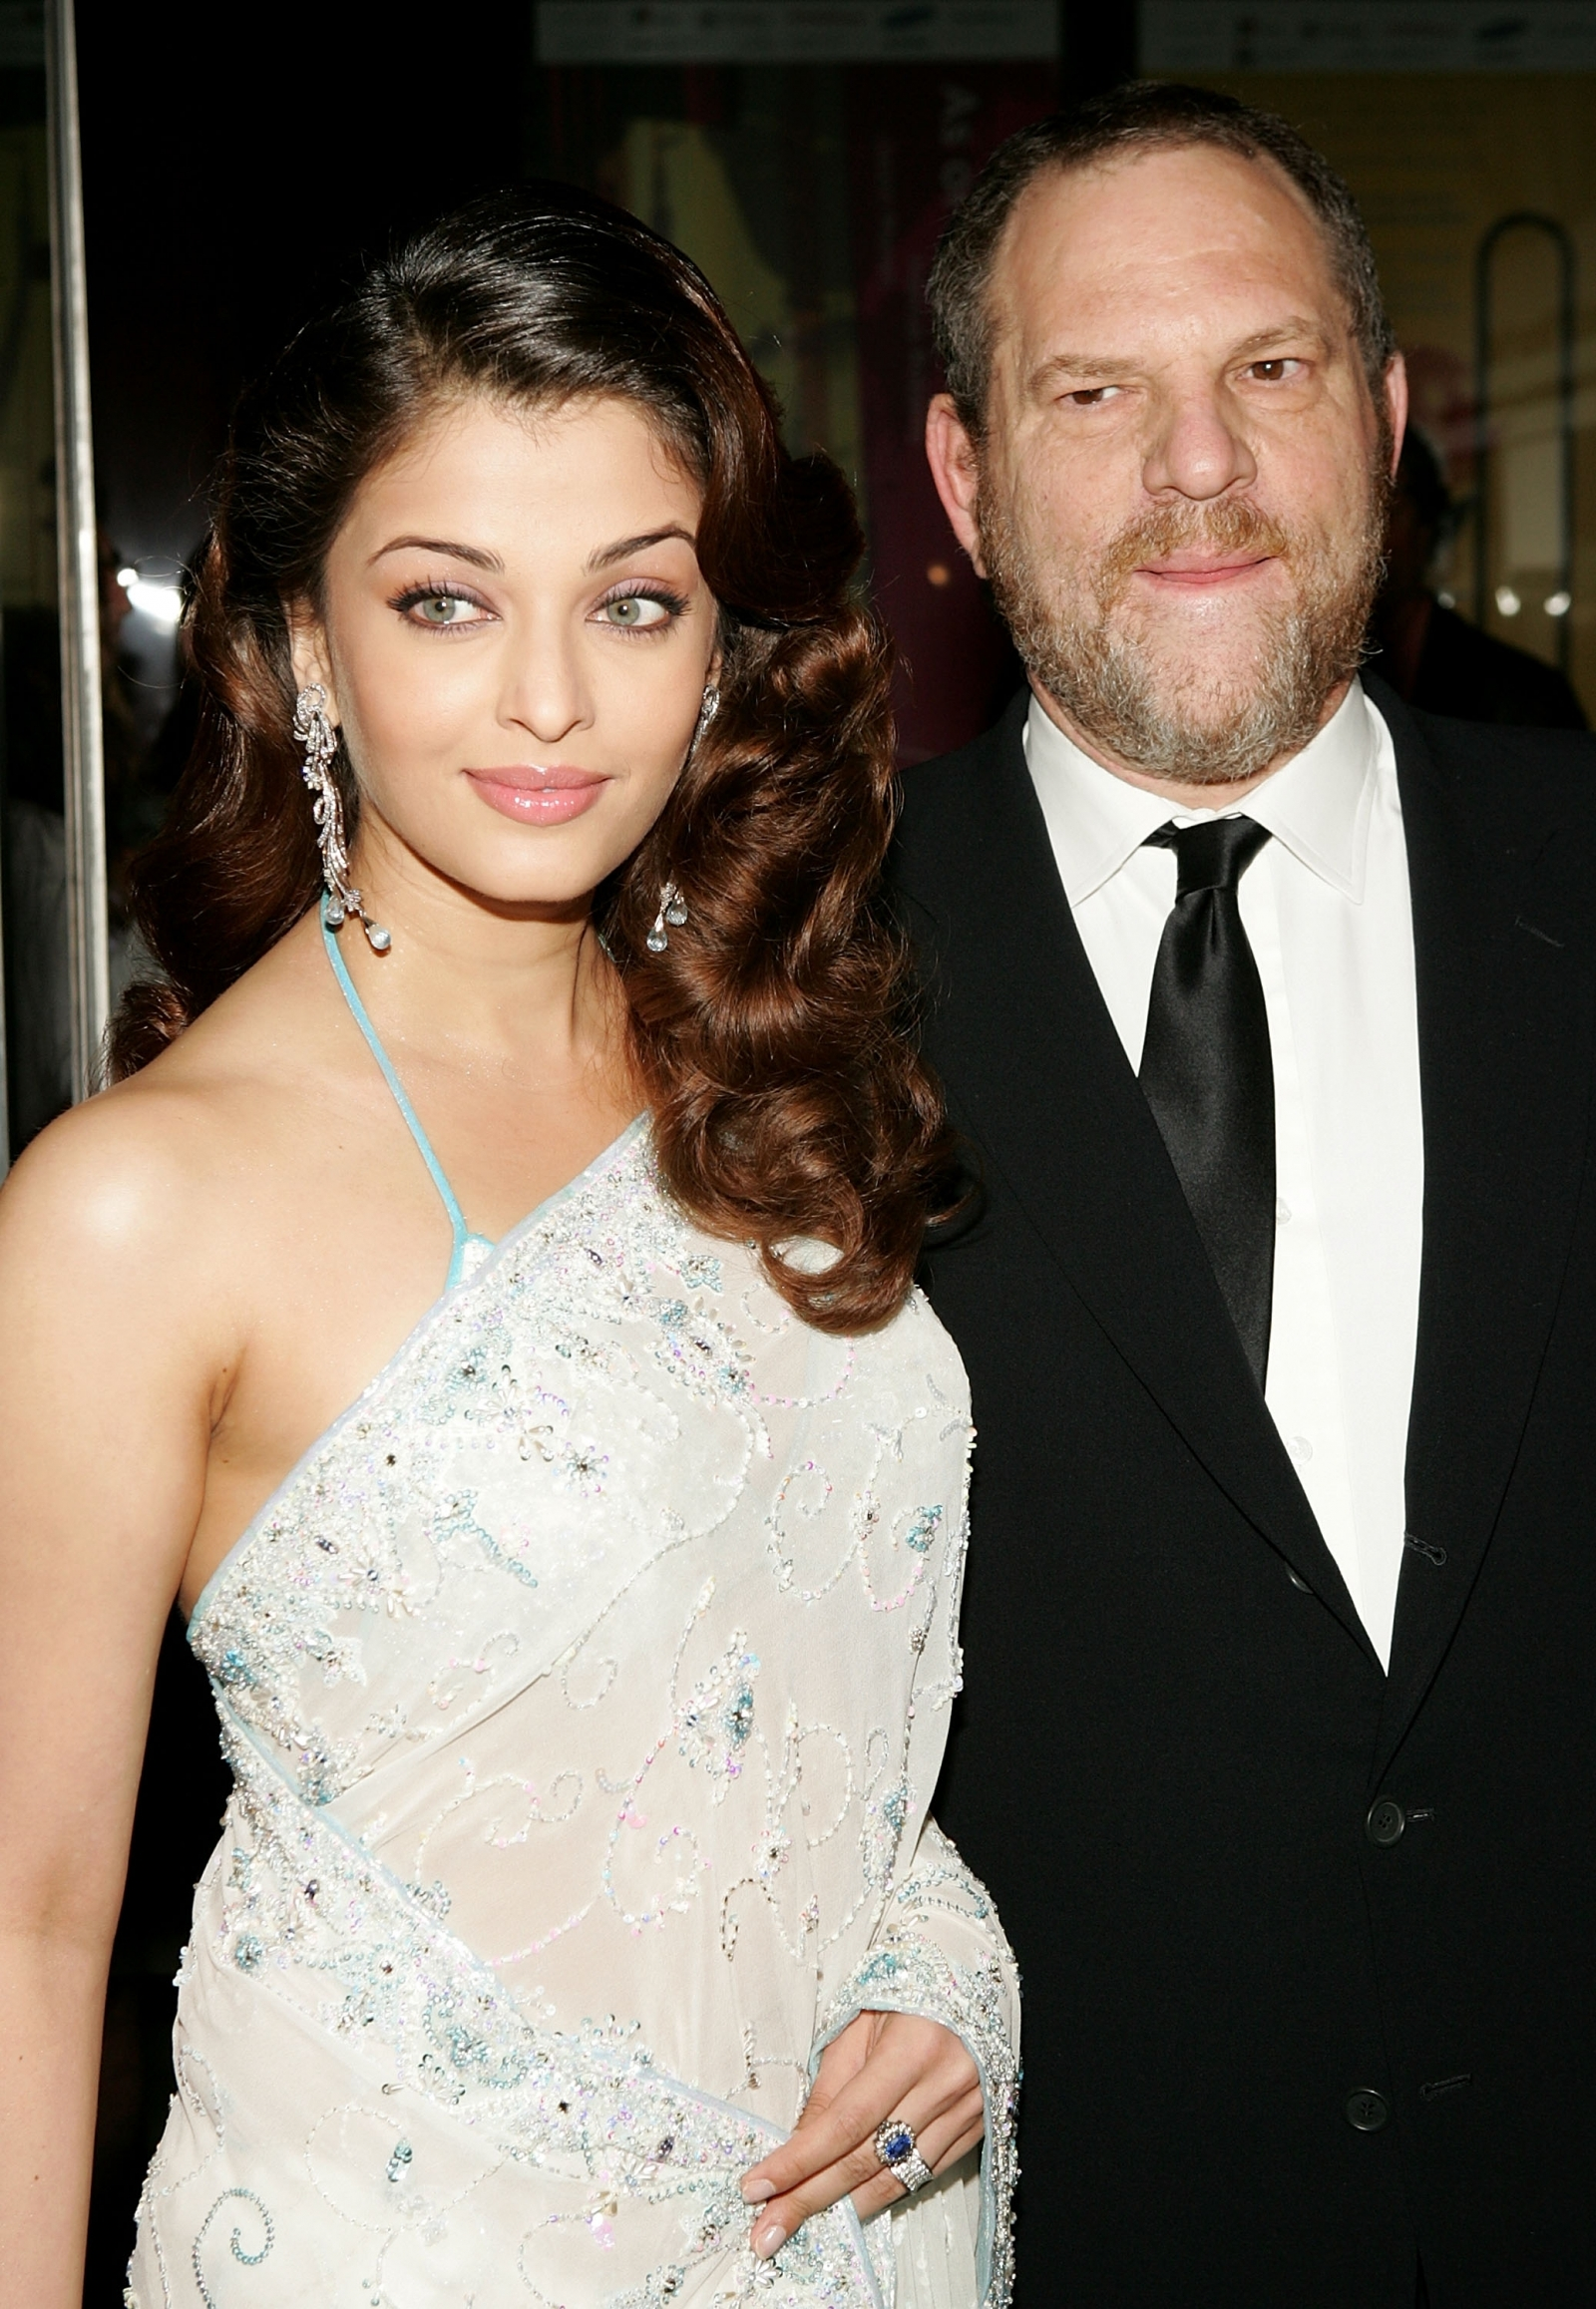 Aishwarya Rai Bachchan with Harvey Weinstein